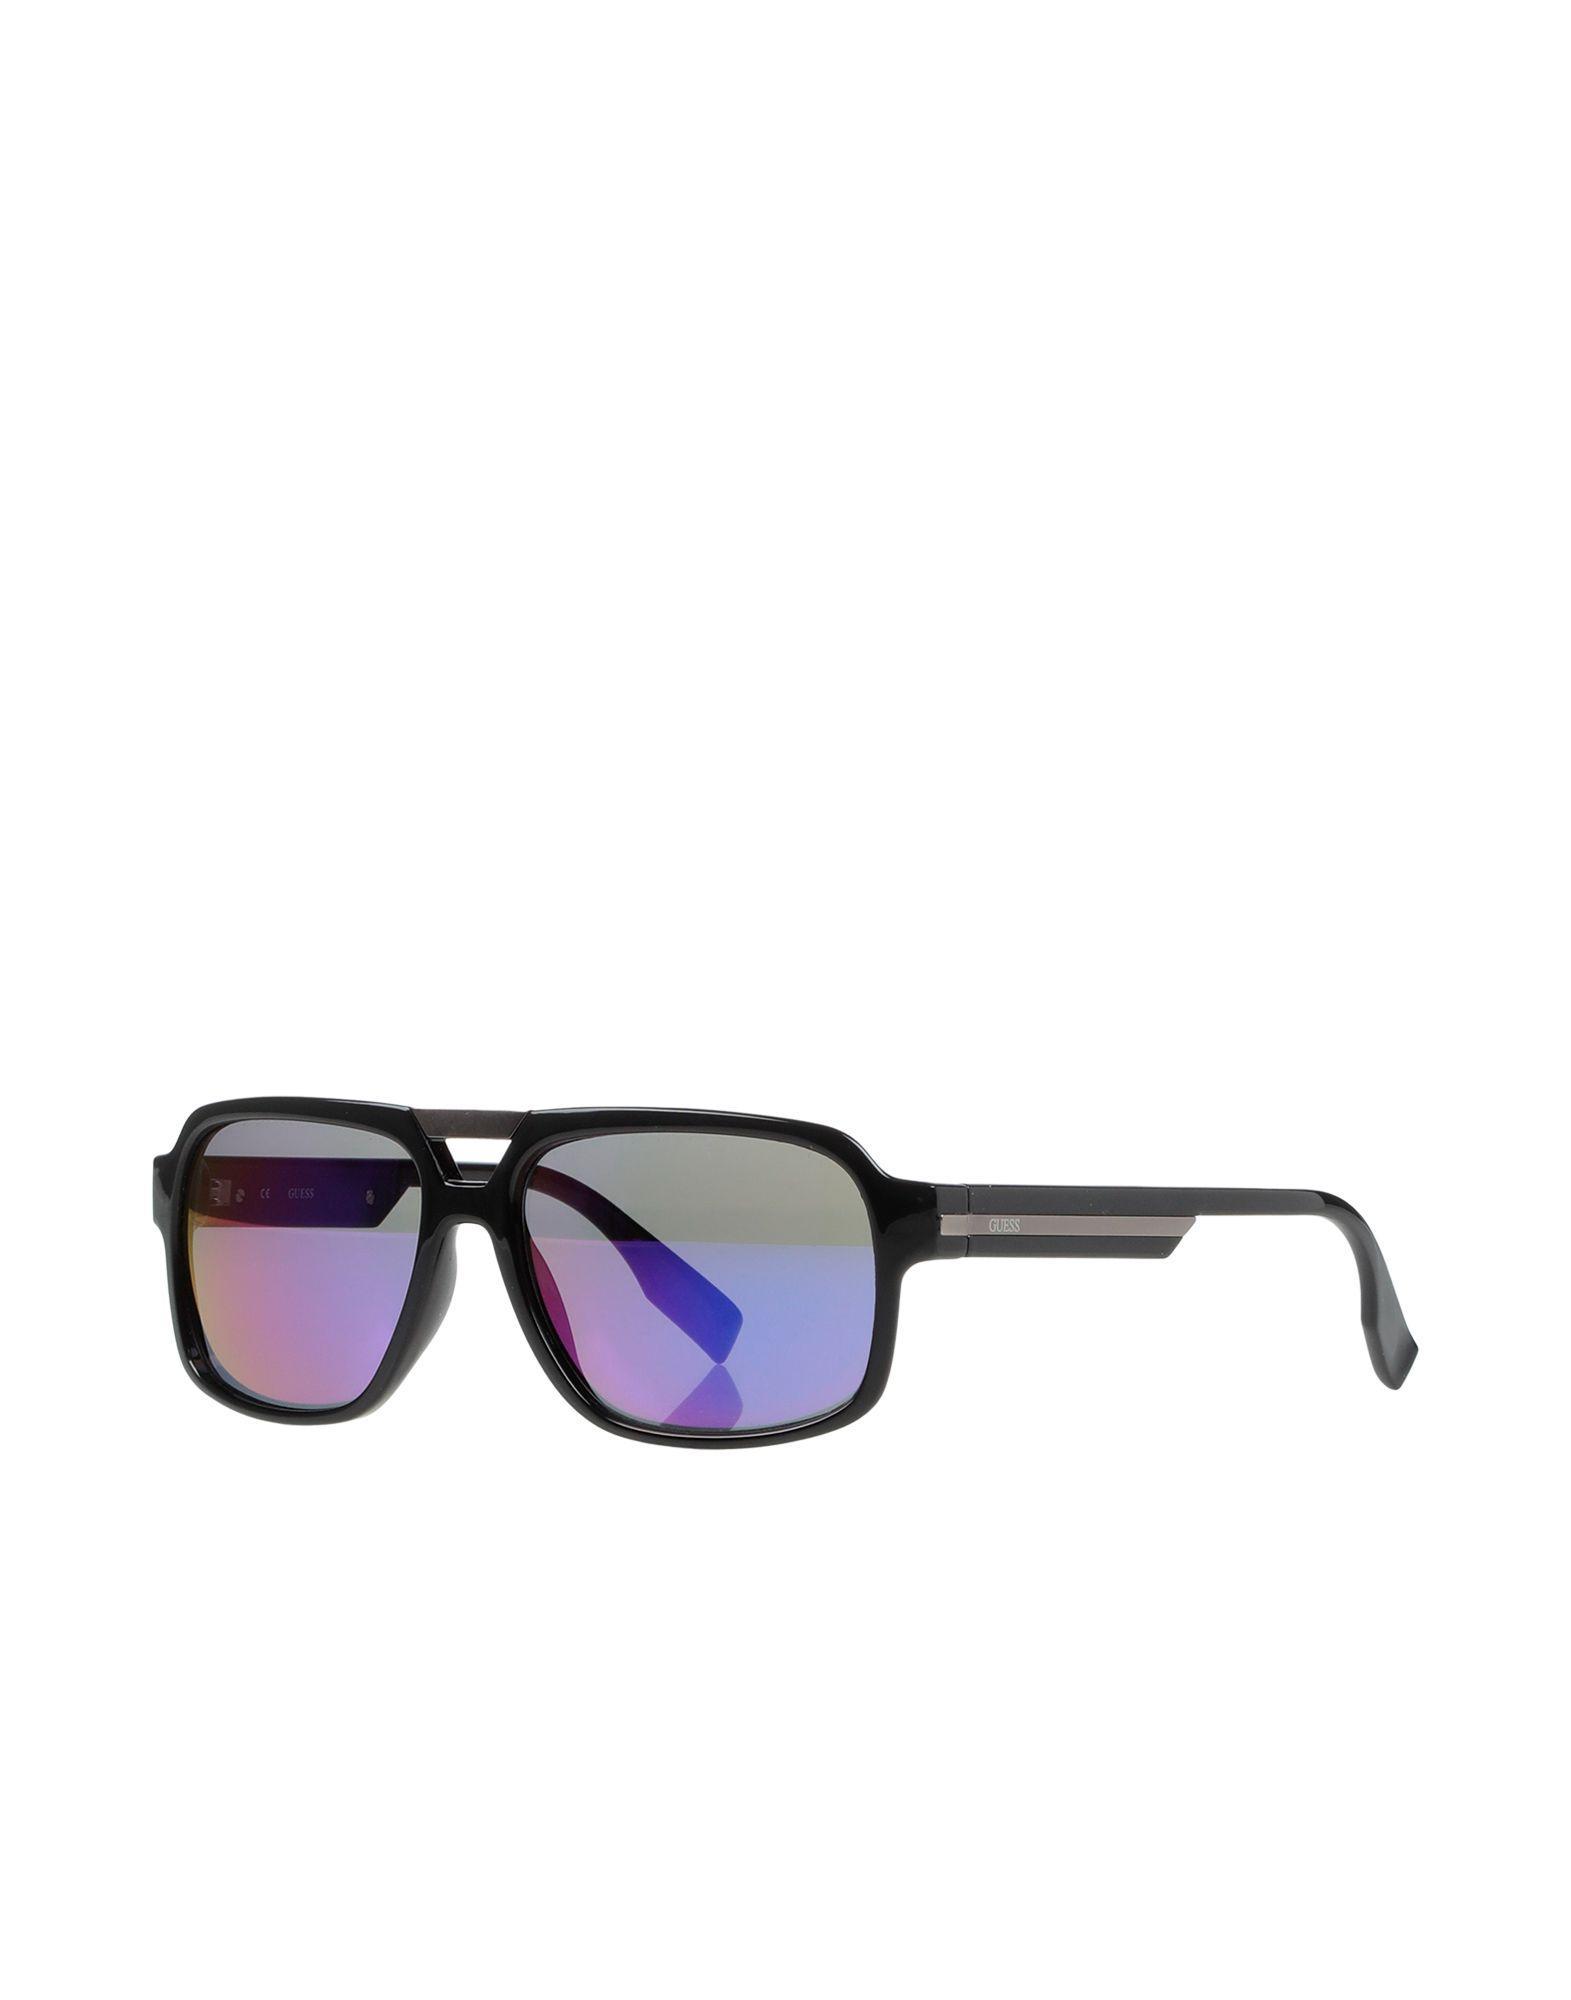 8b1dc6bde4bc2 Guess - Black Sunglasses for Men - Lyst. View fullscreen